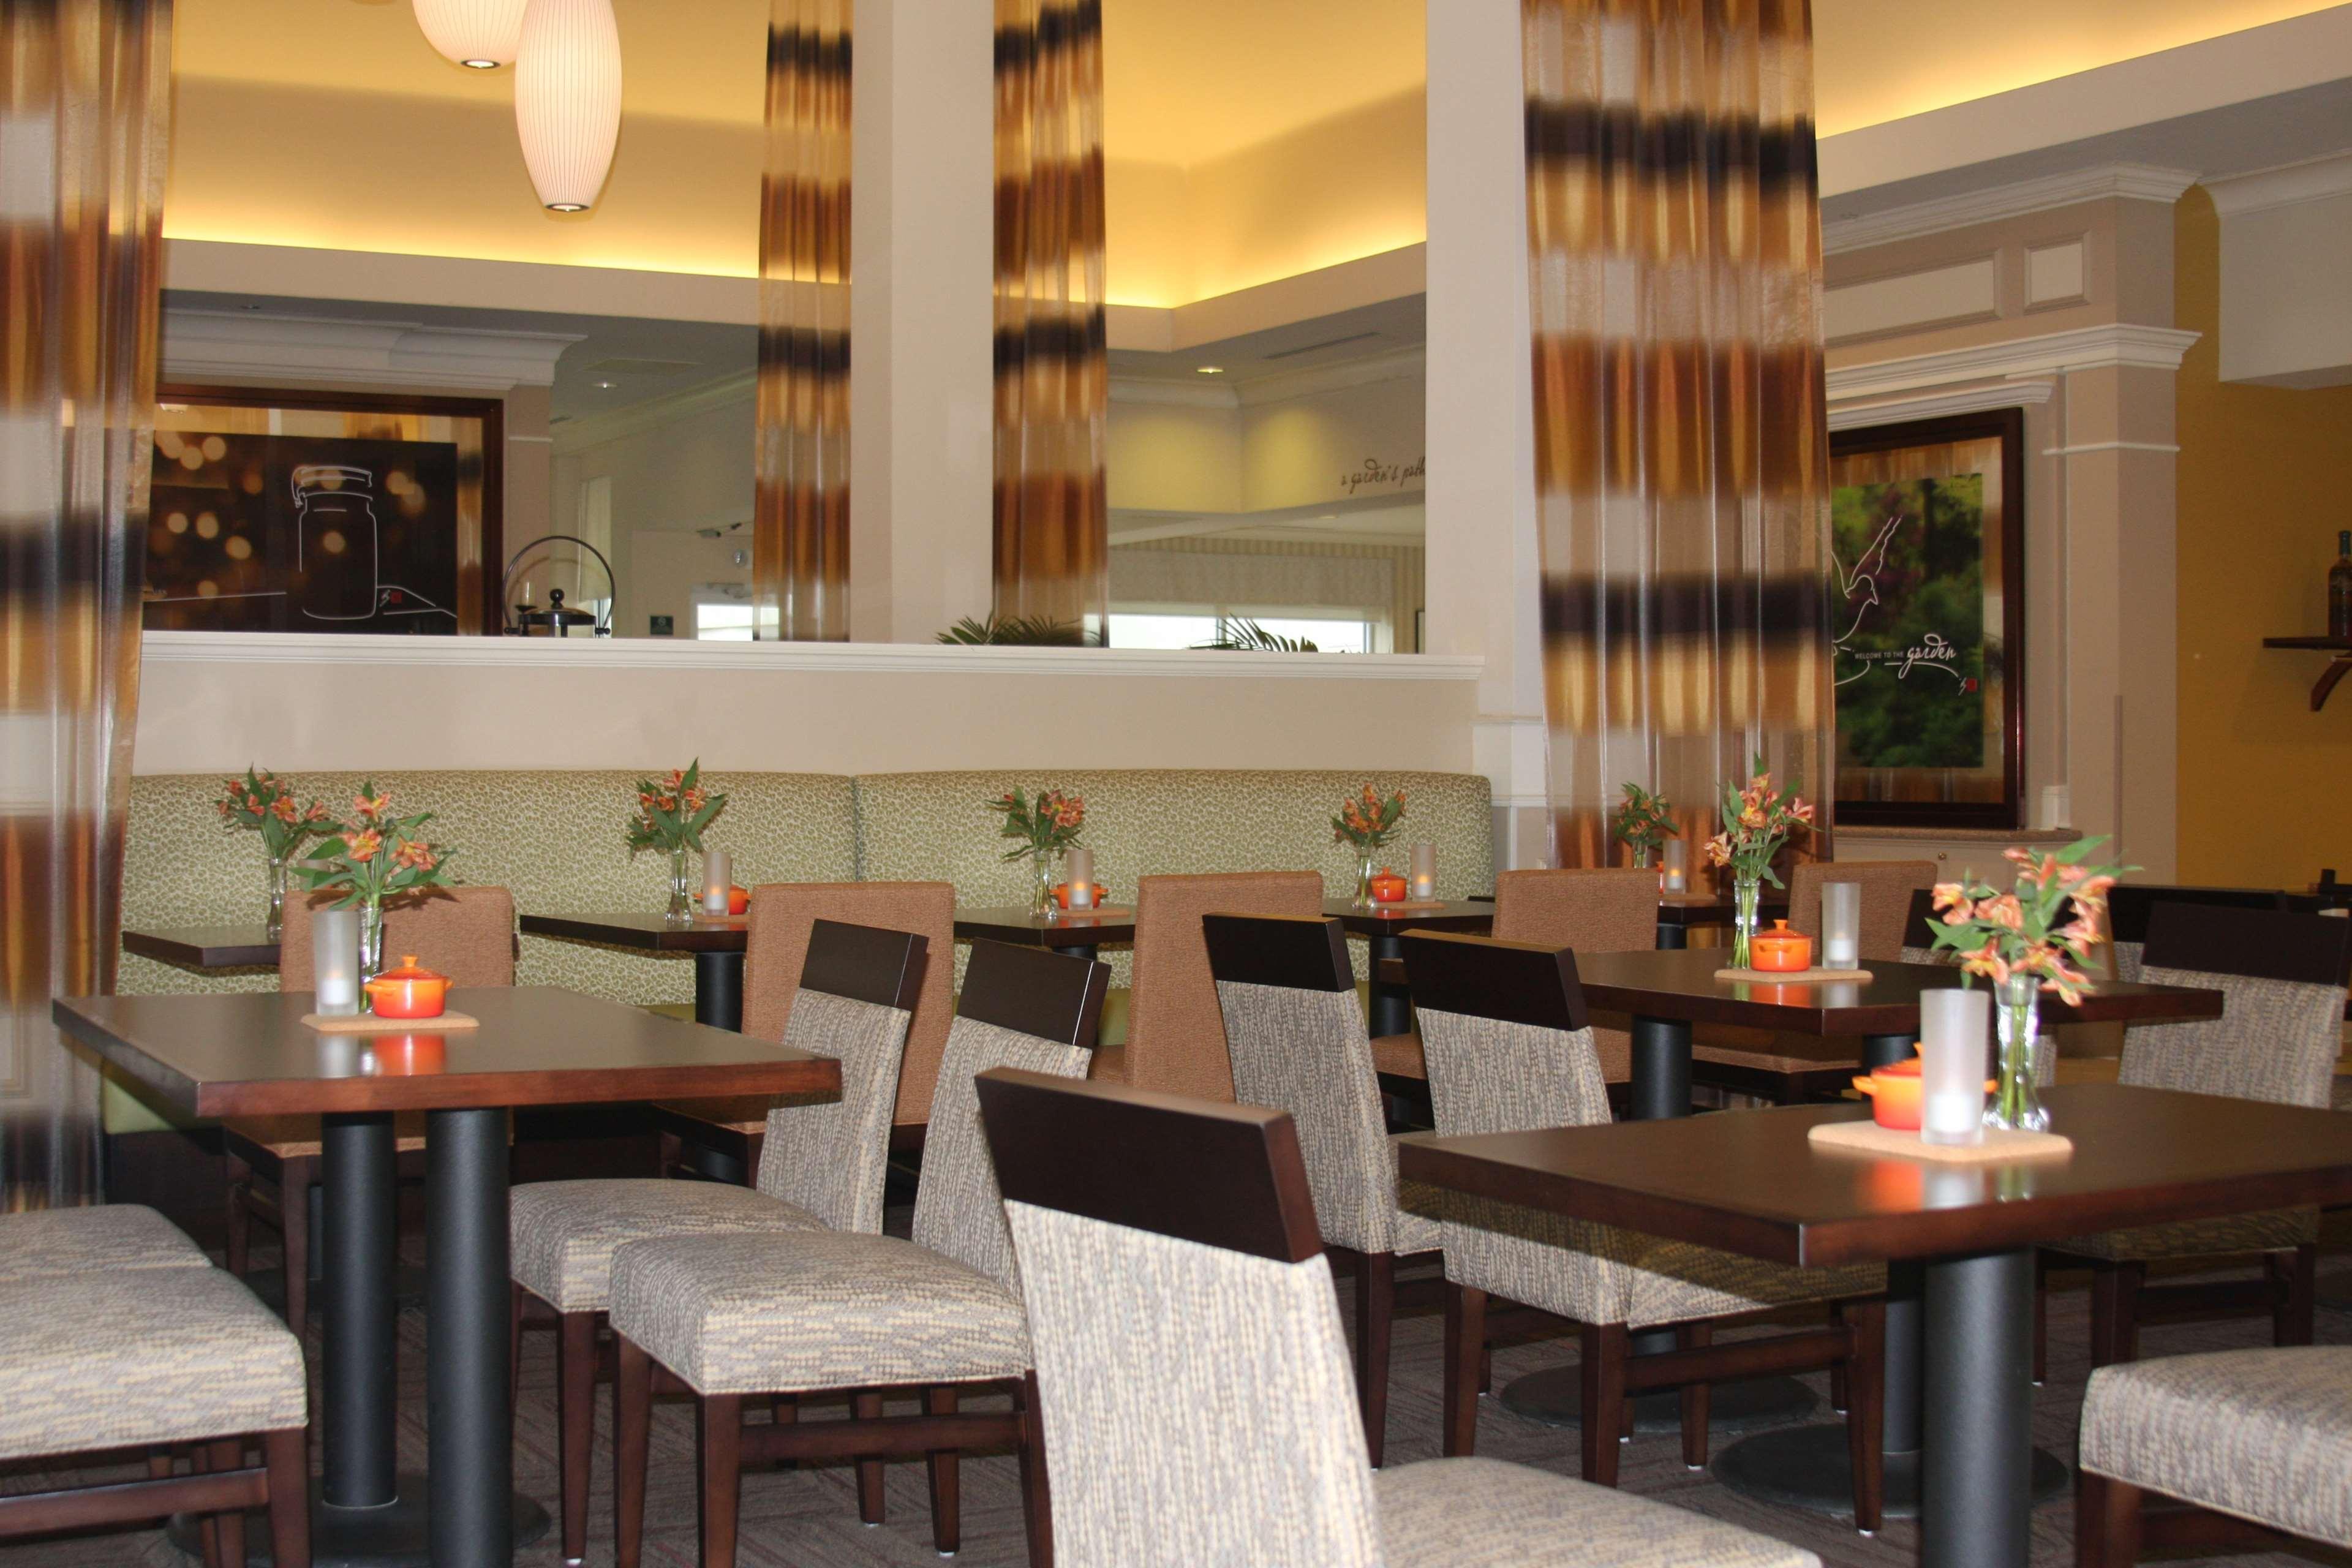 Hilton Garden Inn Elmira/Corning image 15